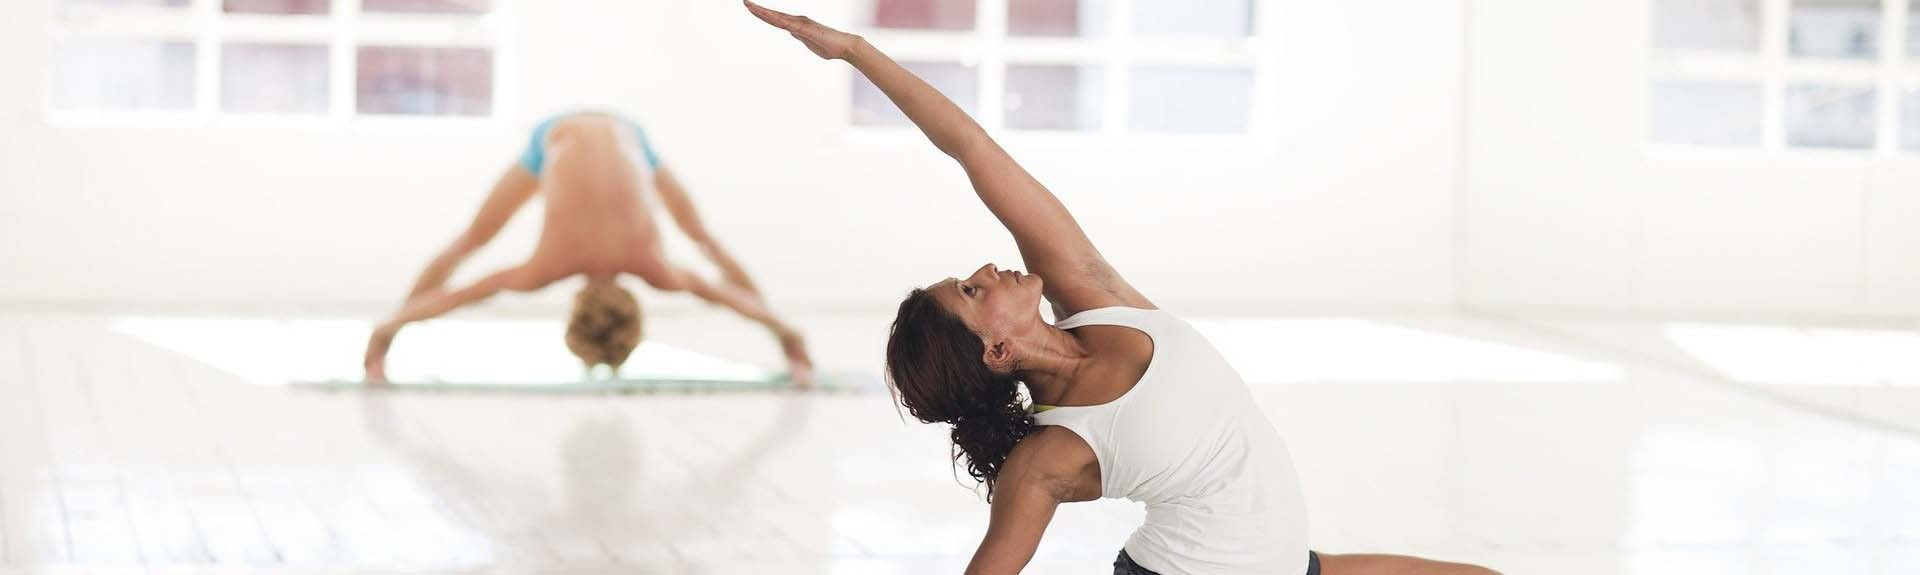 Yoga, Pilâtes